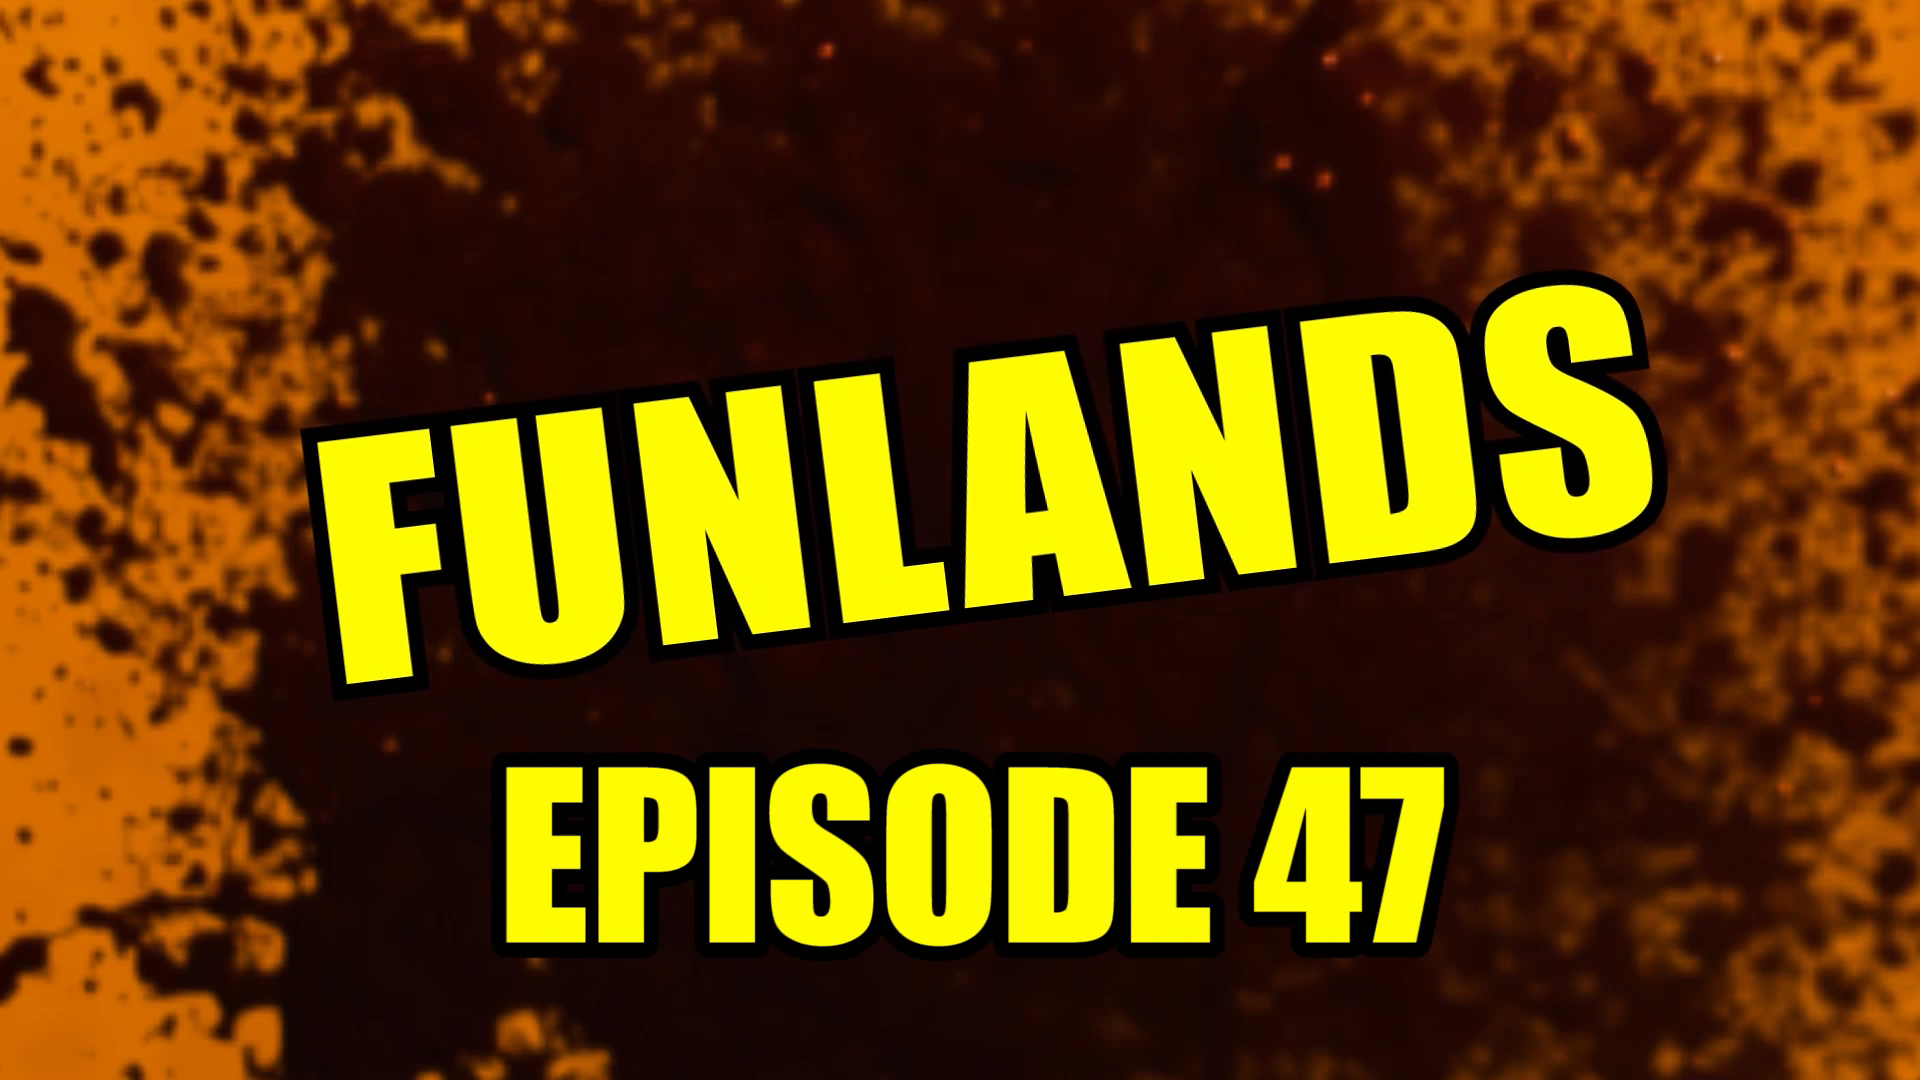 Funlands Episode 47.jpg